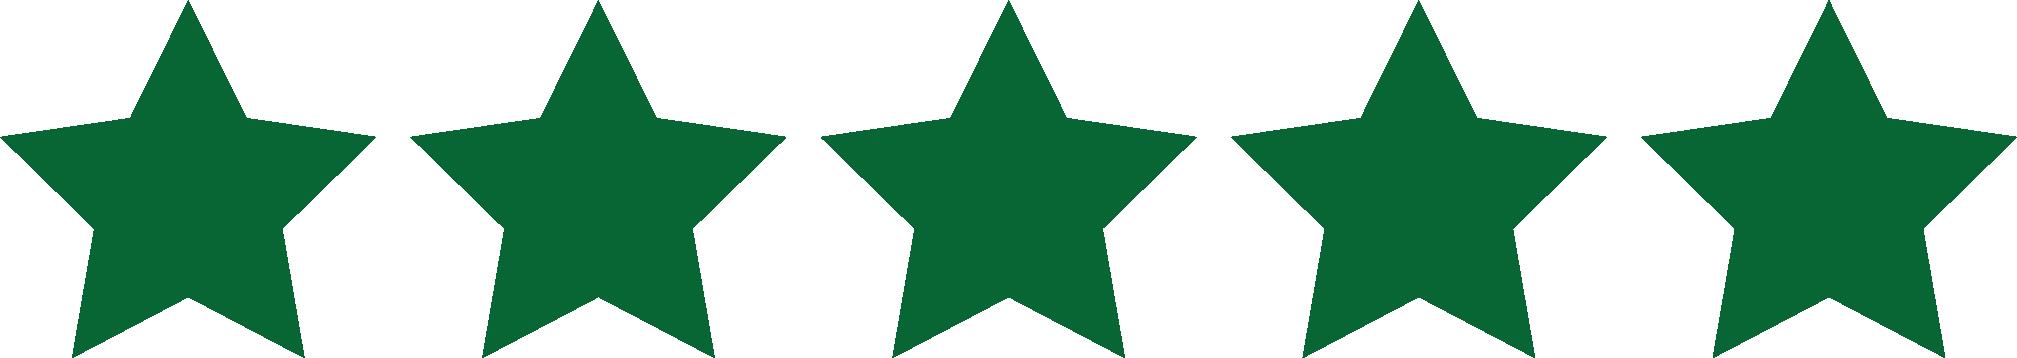 Sterne-d-gruen